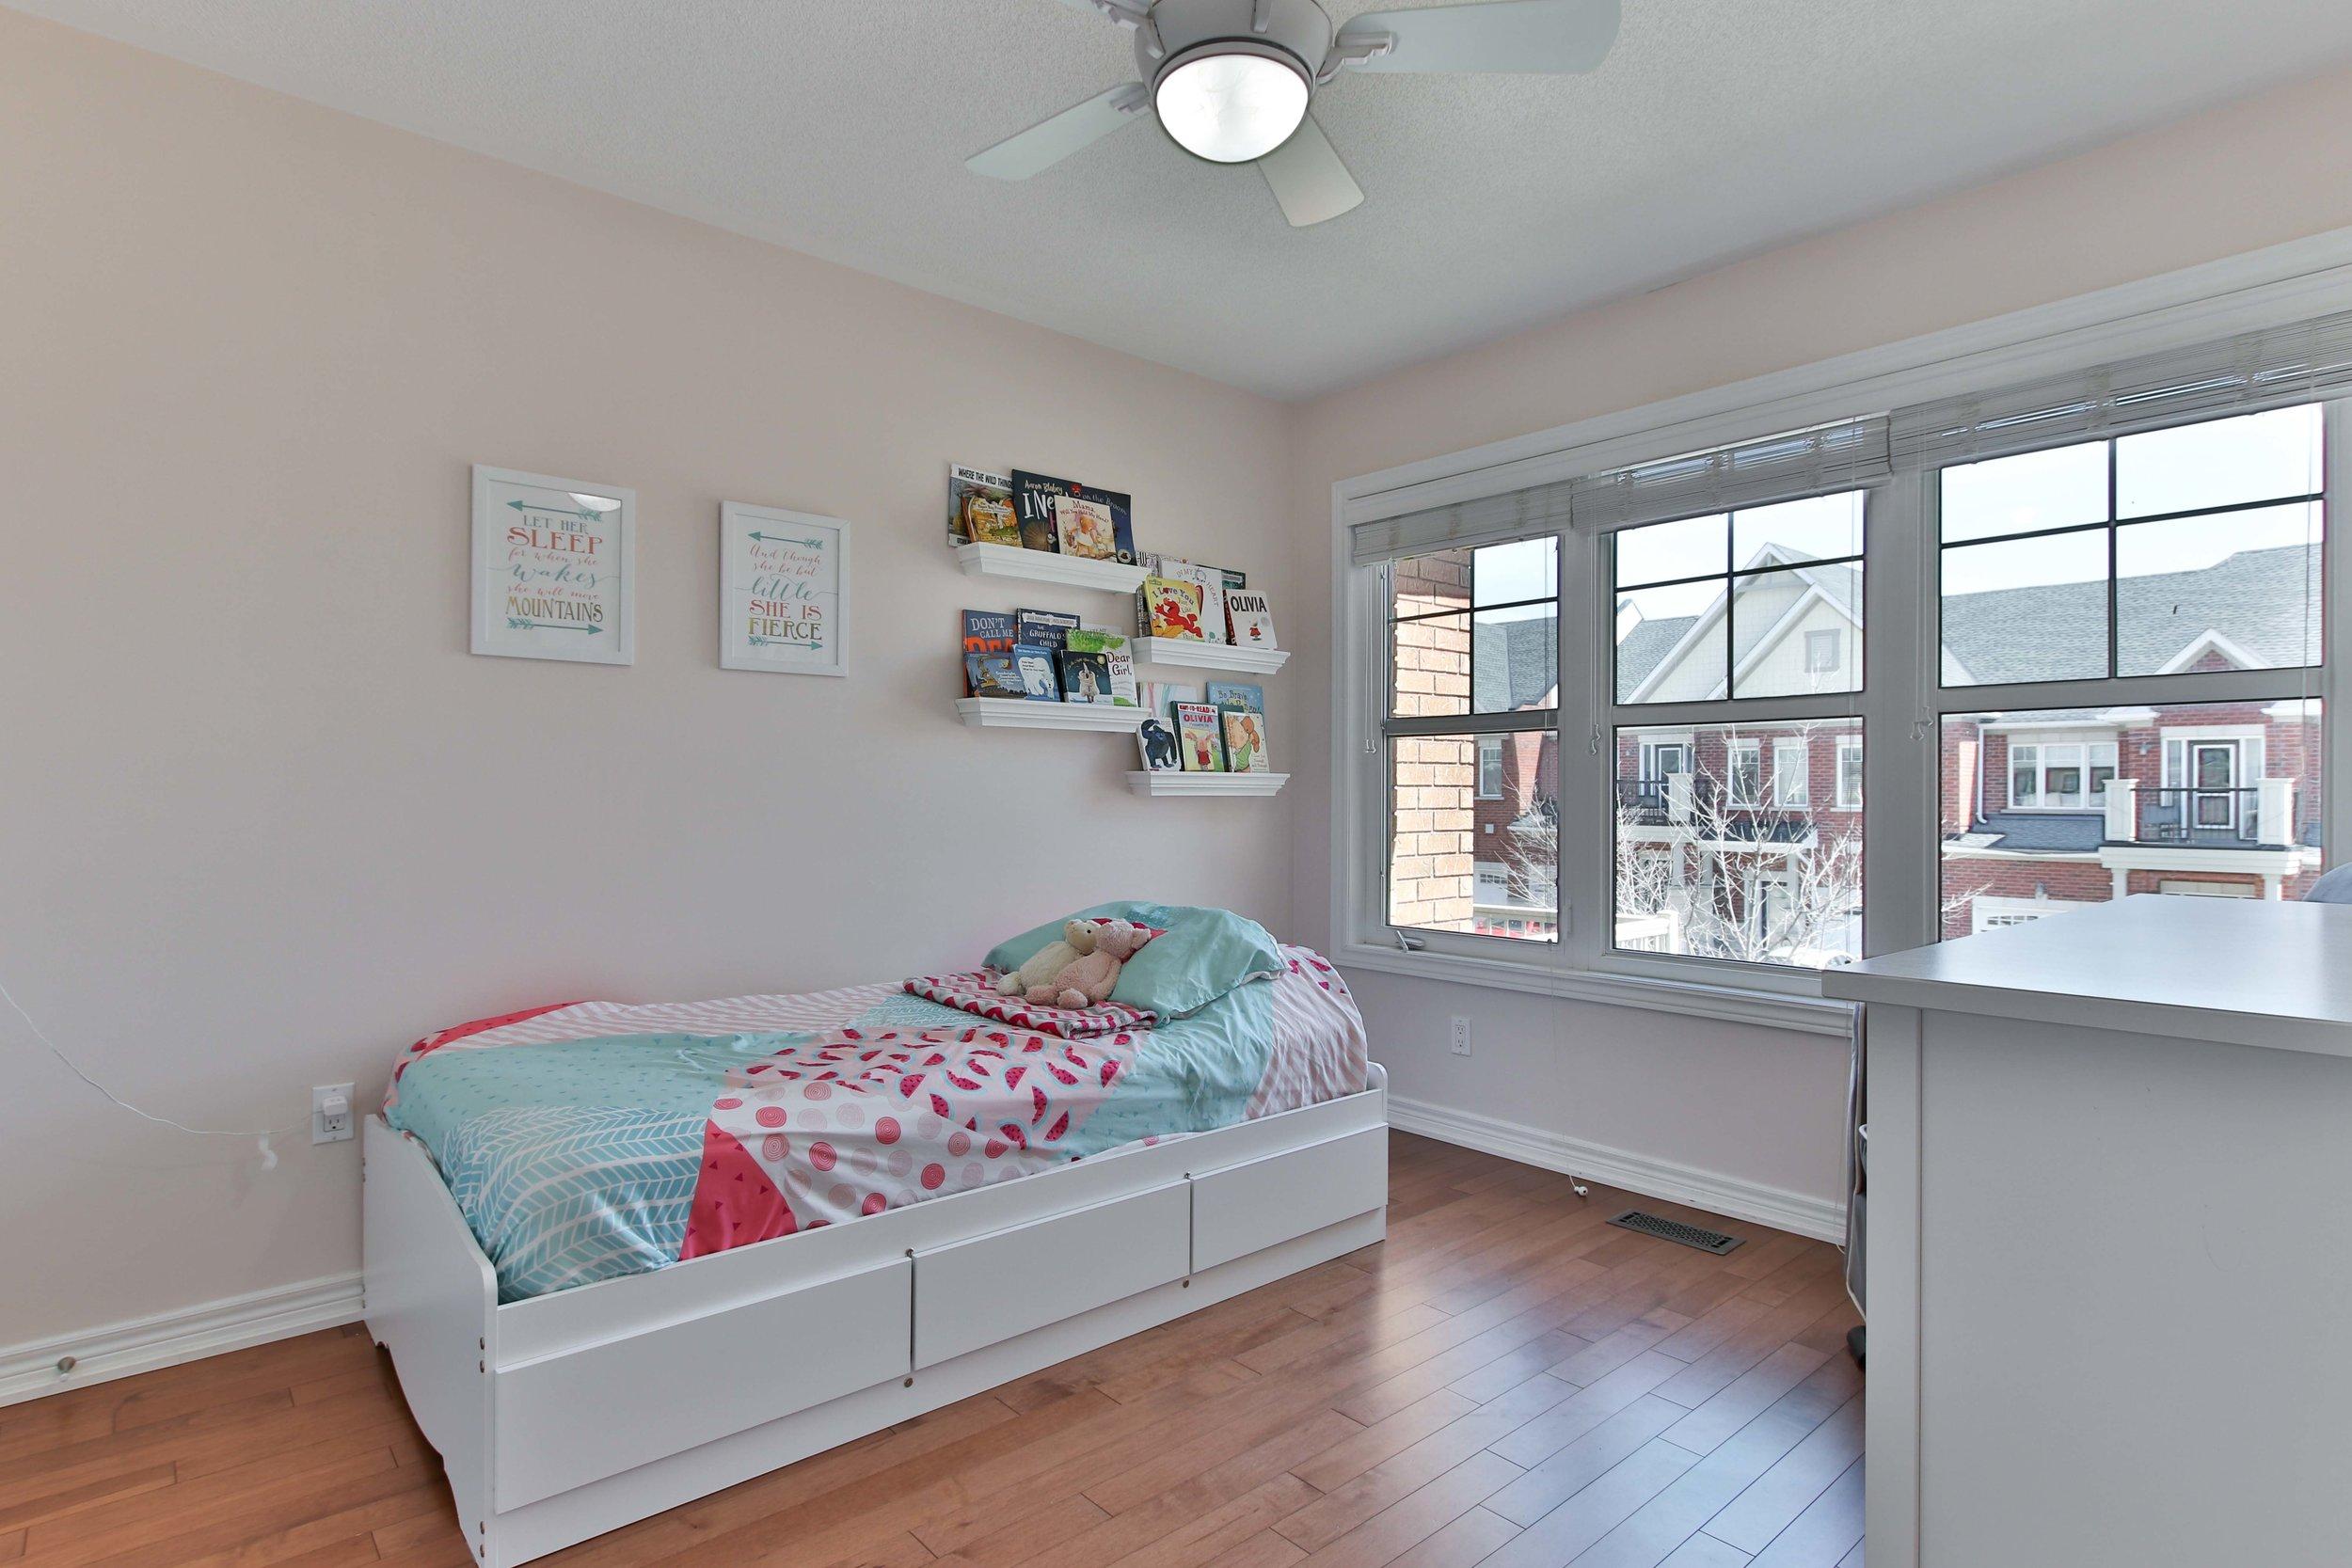 36_Bedroom.jpg